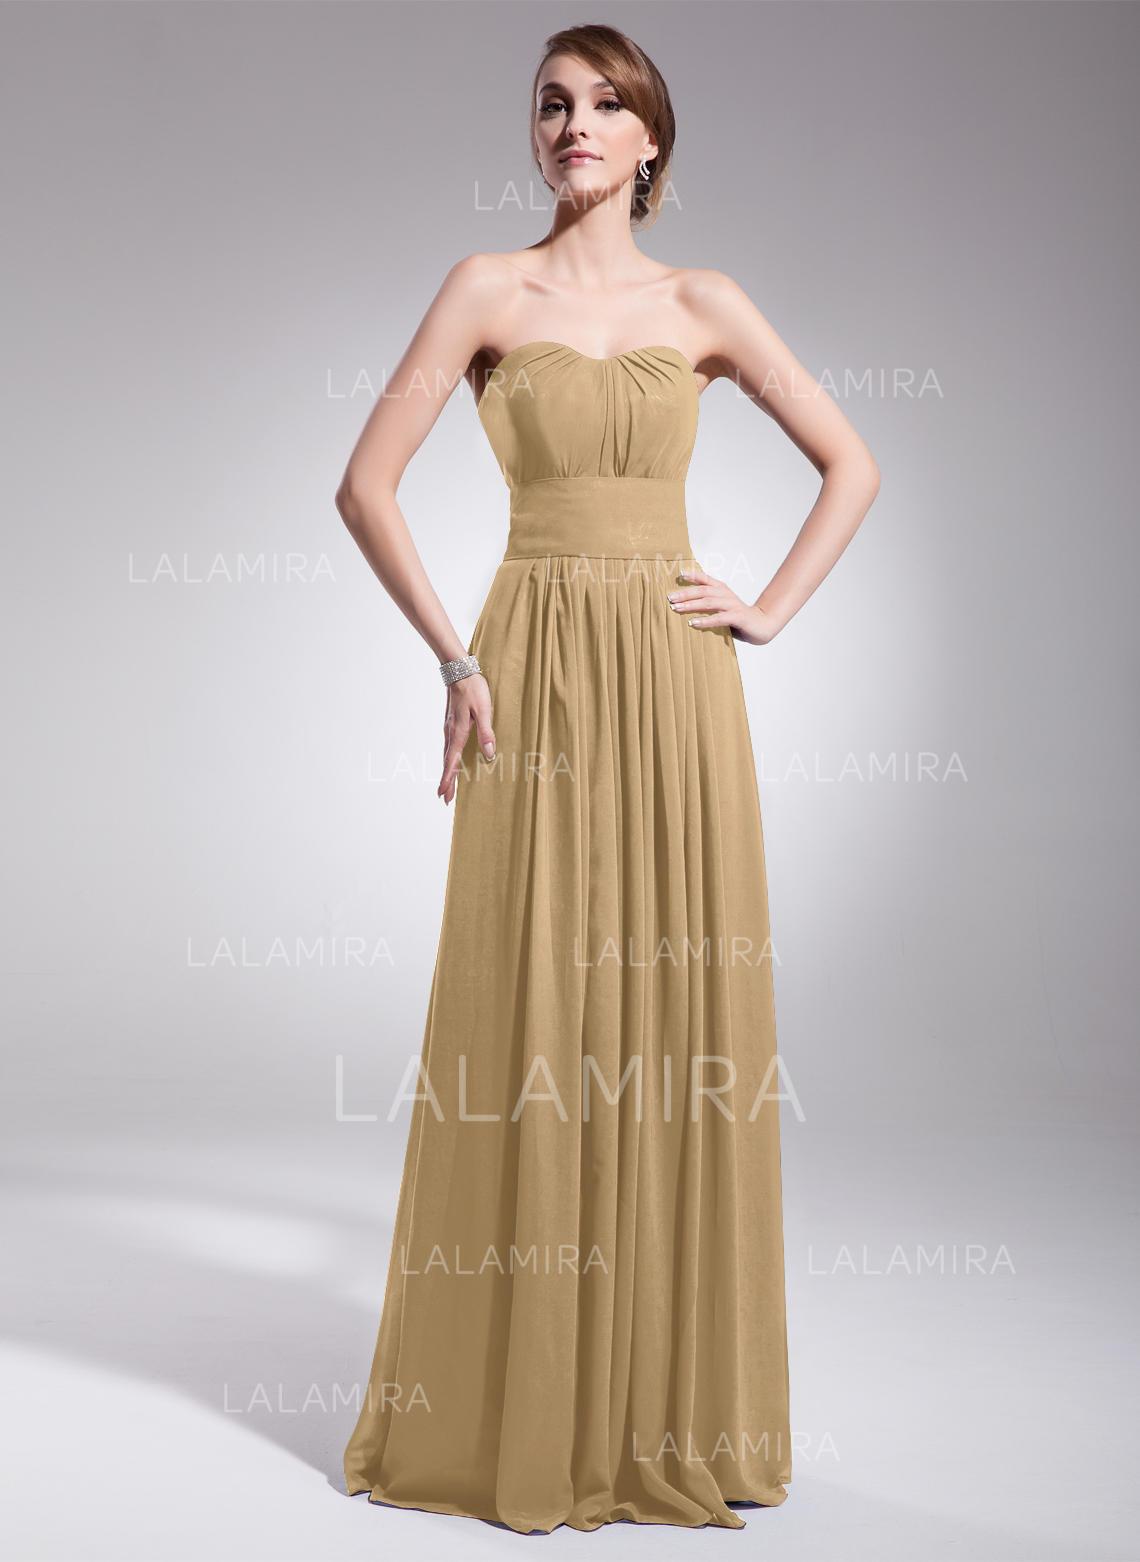 91c35b18be48 A-Line/Princess Chiffon Bridesmaid Dresses Ruffle Sweetheart Sleeveless  Floor-Length (007063017. Loading zoom